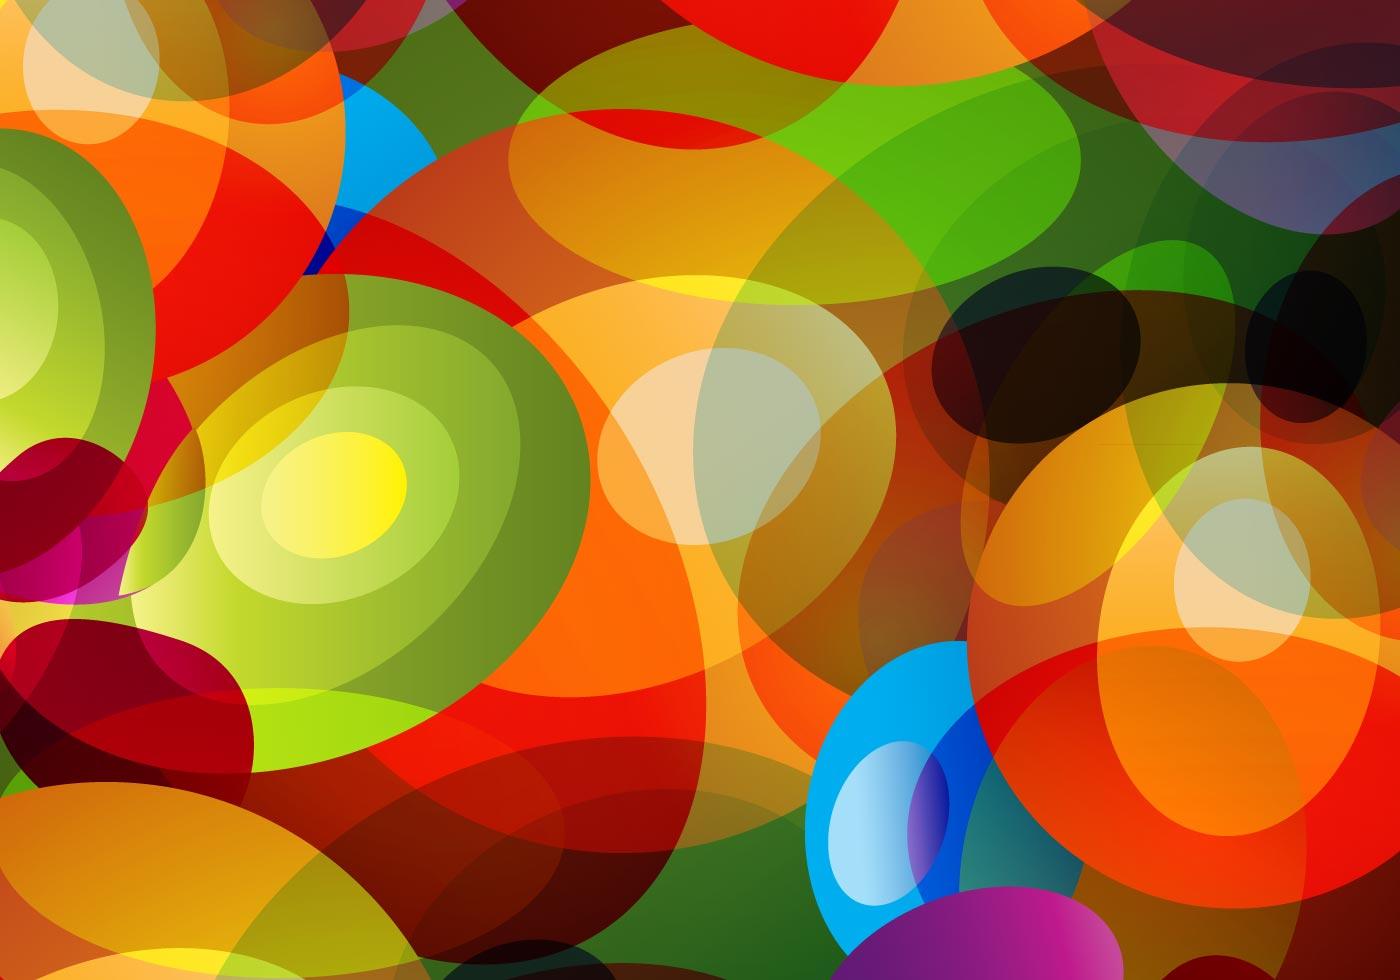 3d Rainbow Psychedeli Wallpaper Colorful Psychodelia Background Download Free Vector Art